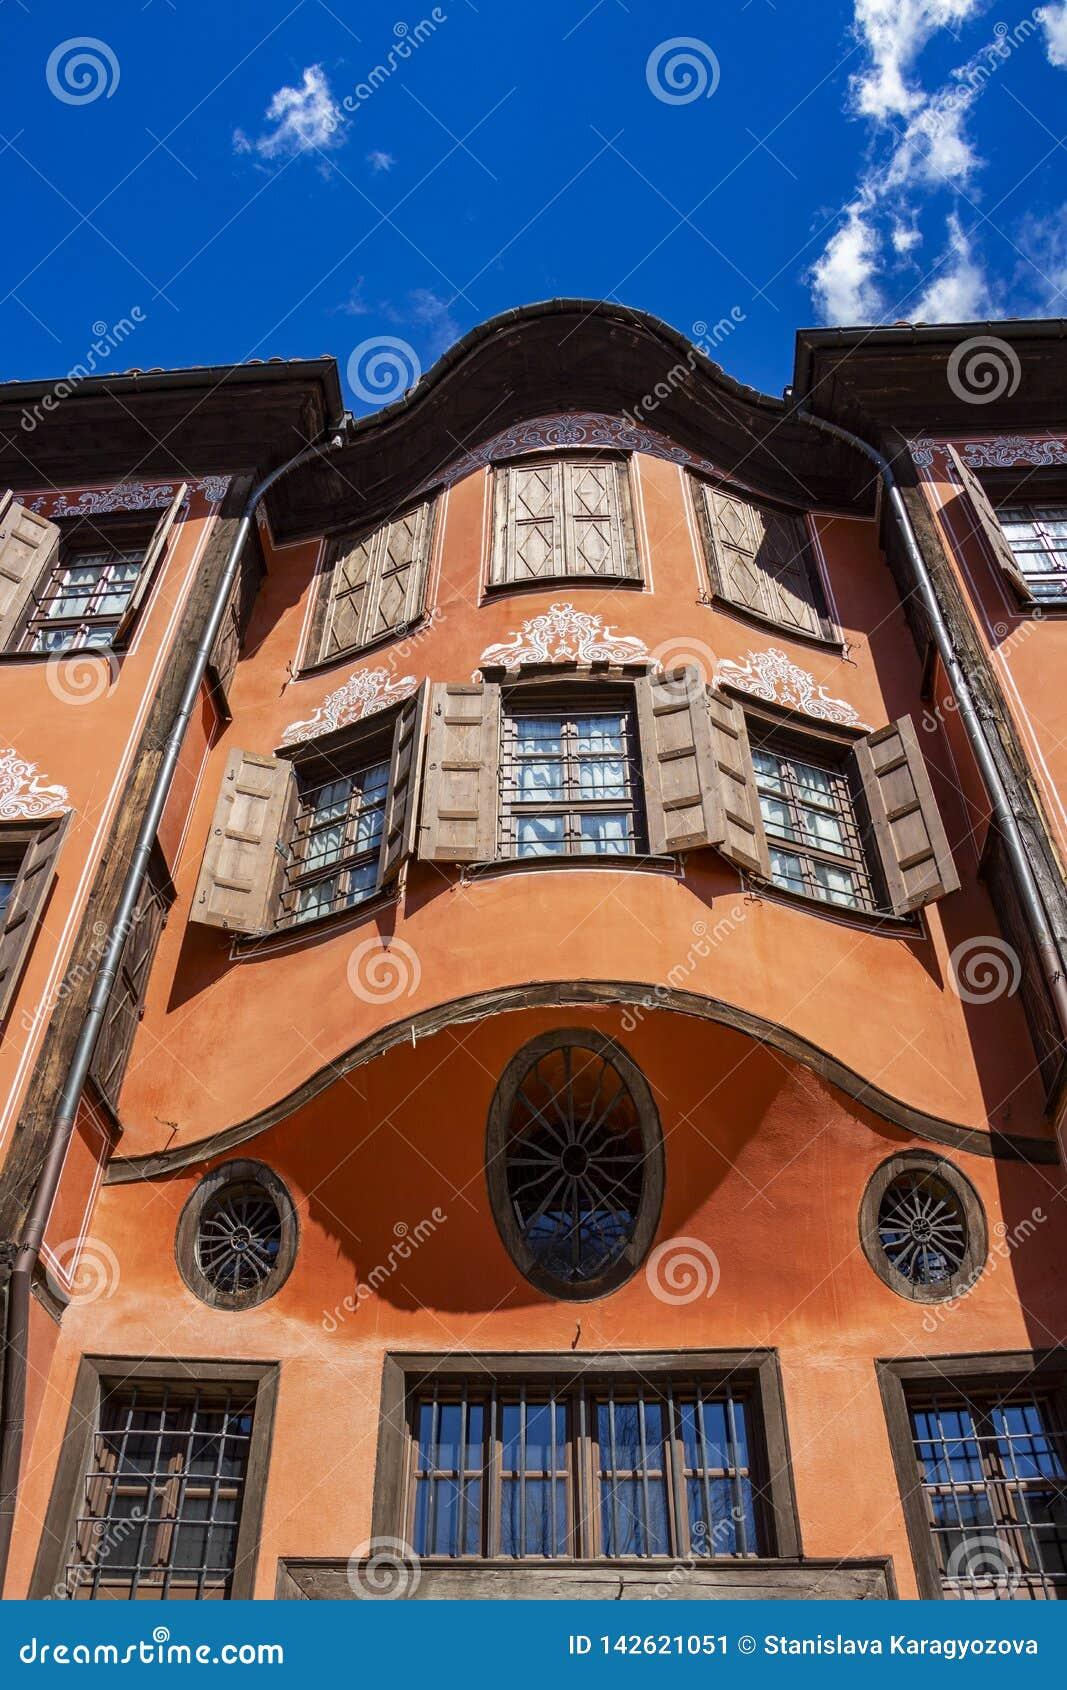 Belle vecchie case, dettaglio architettonico